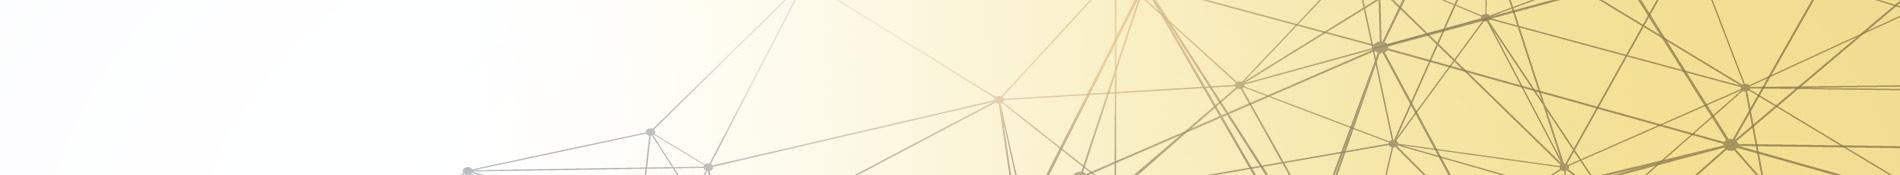 fondo-pano-amarillo.jpg